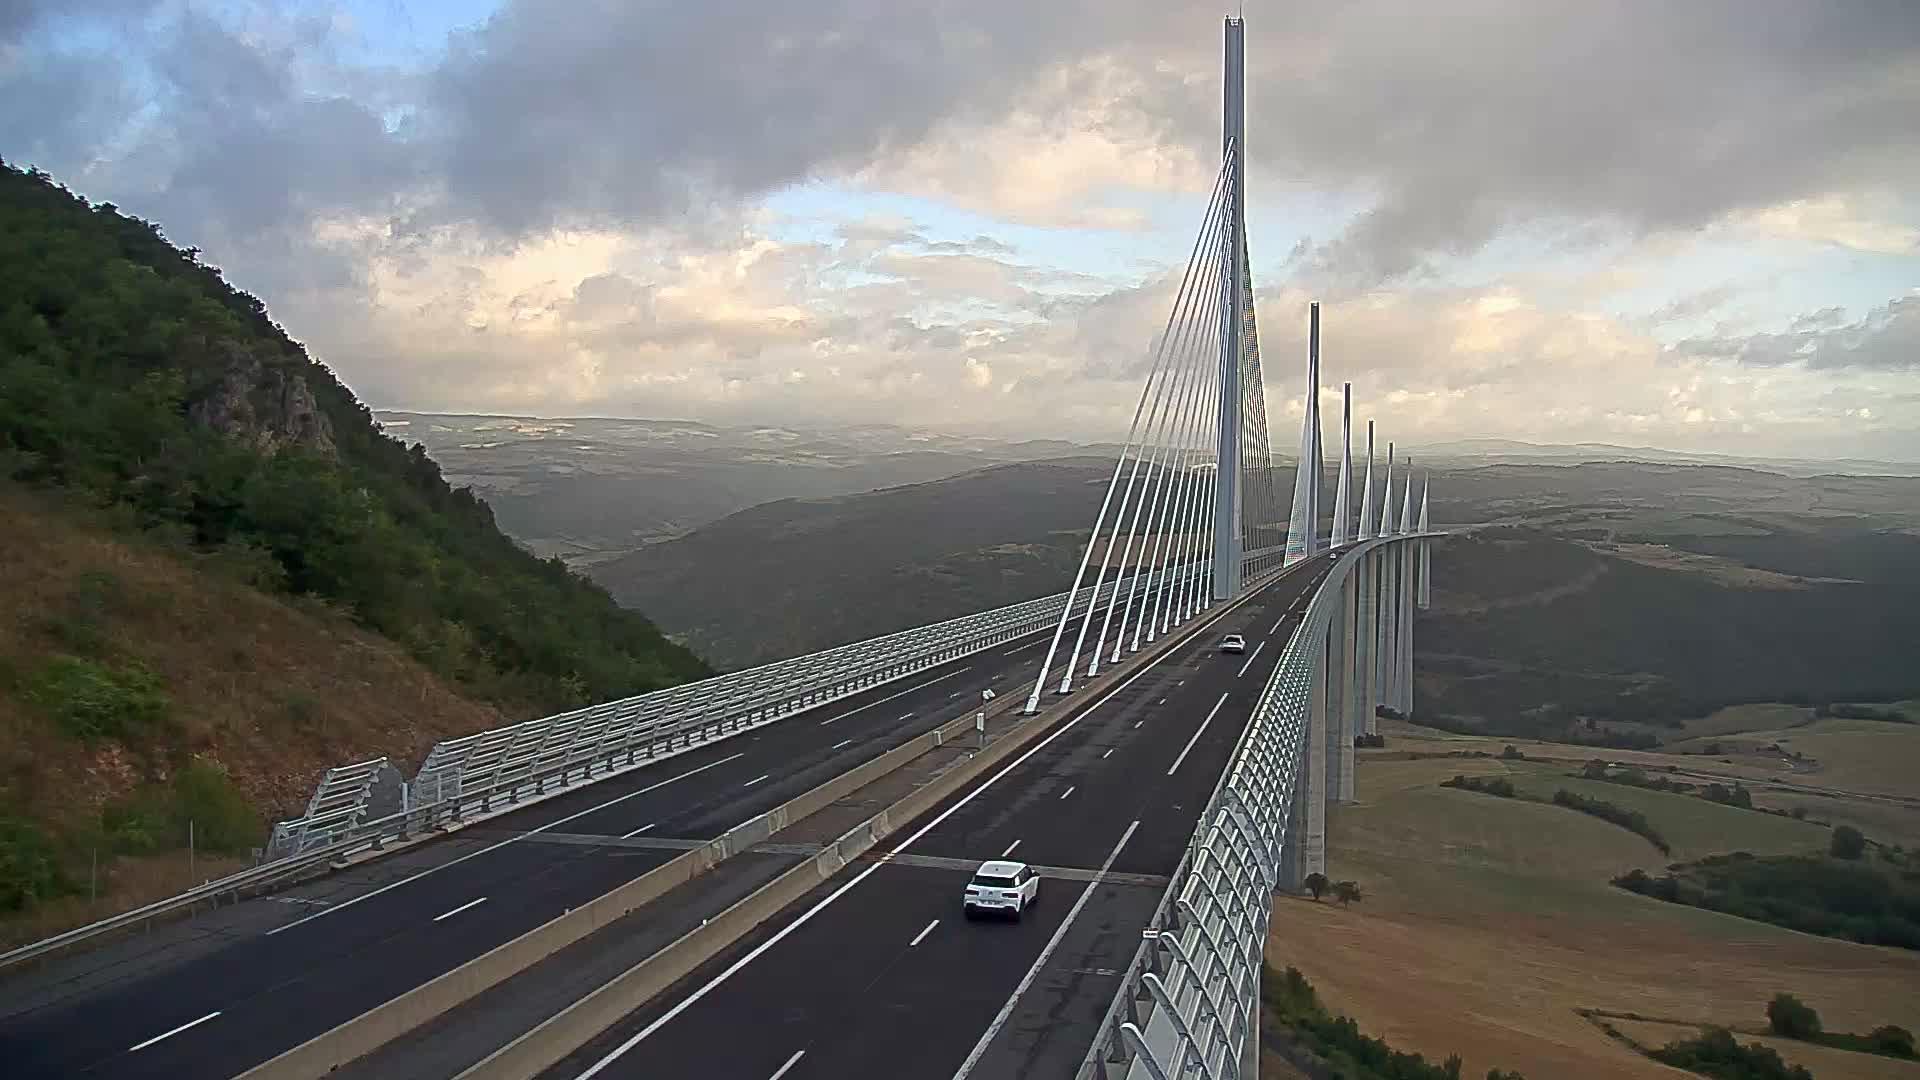 Millau Viaduct Wed. 07:49